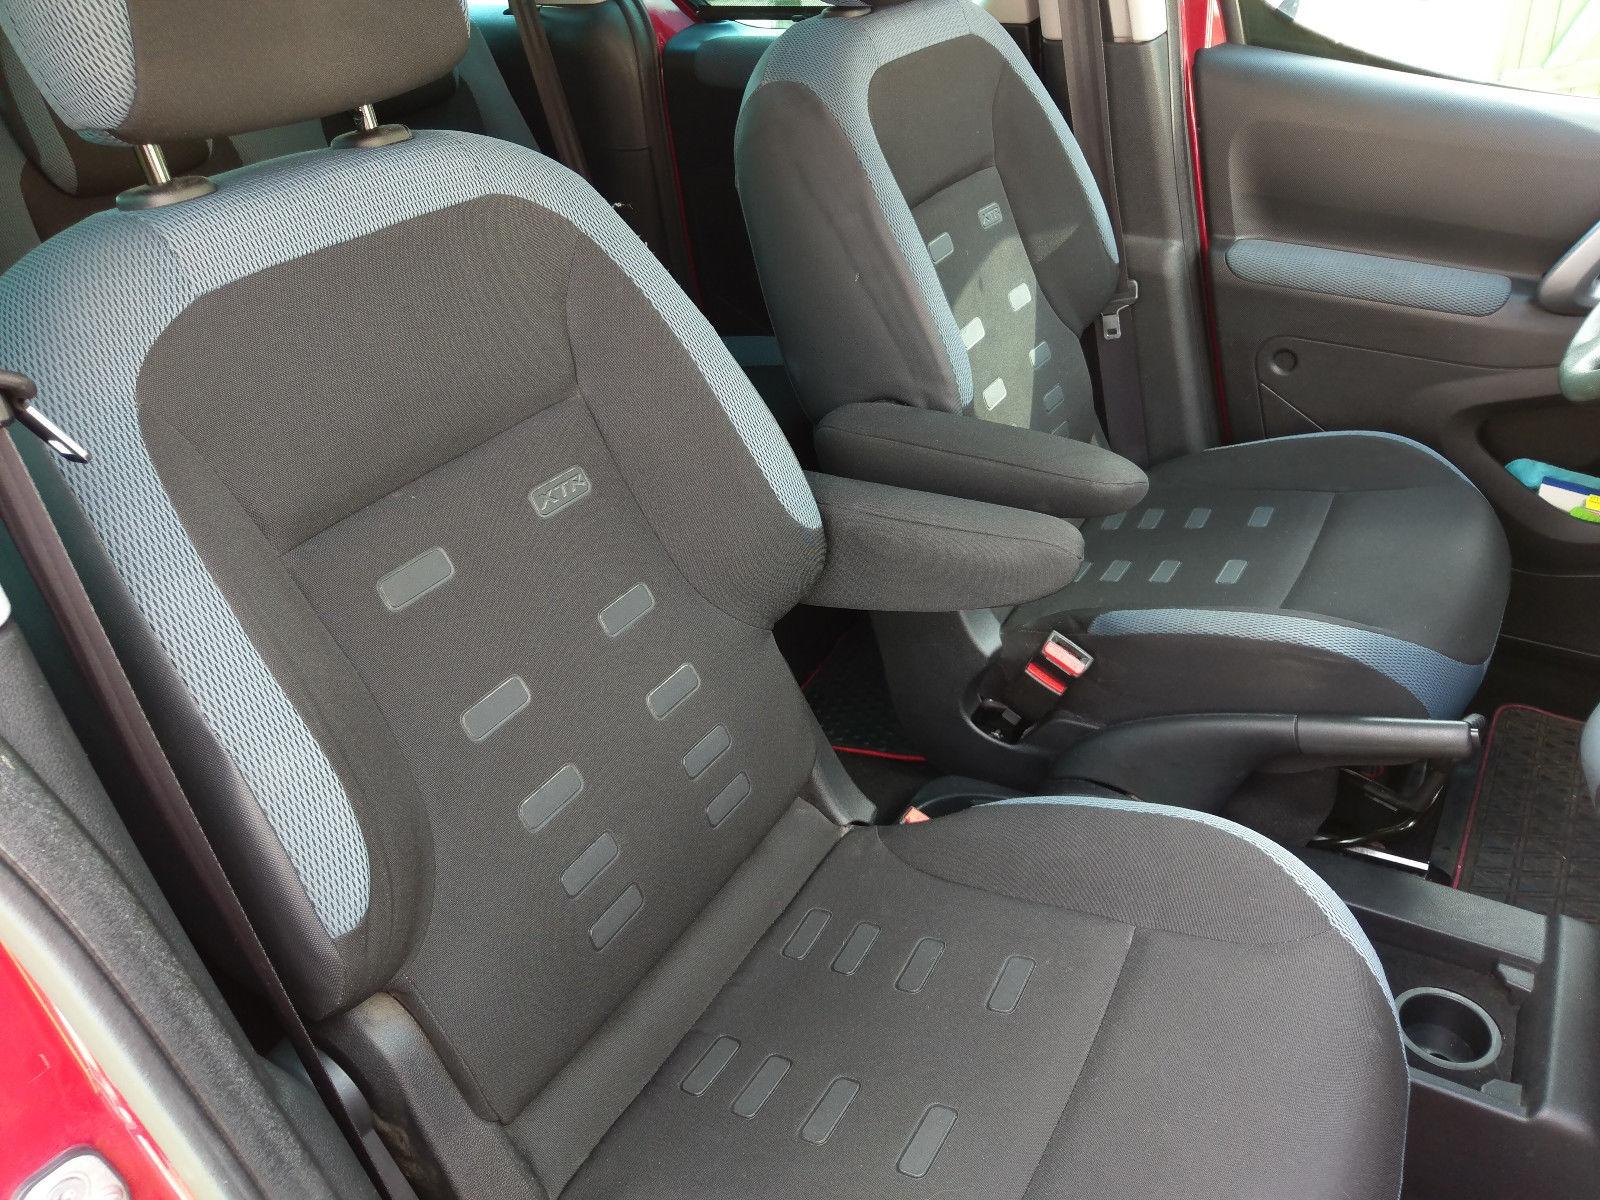 Покупка на кола от Германия - Citroën Berlingo 2010 - 1.6 HDi - 90 к.с. - Mullewapp - Gallery - 22.09.2017 (7)